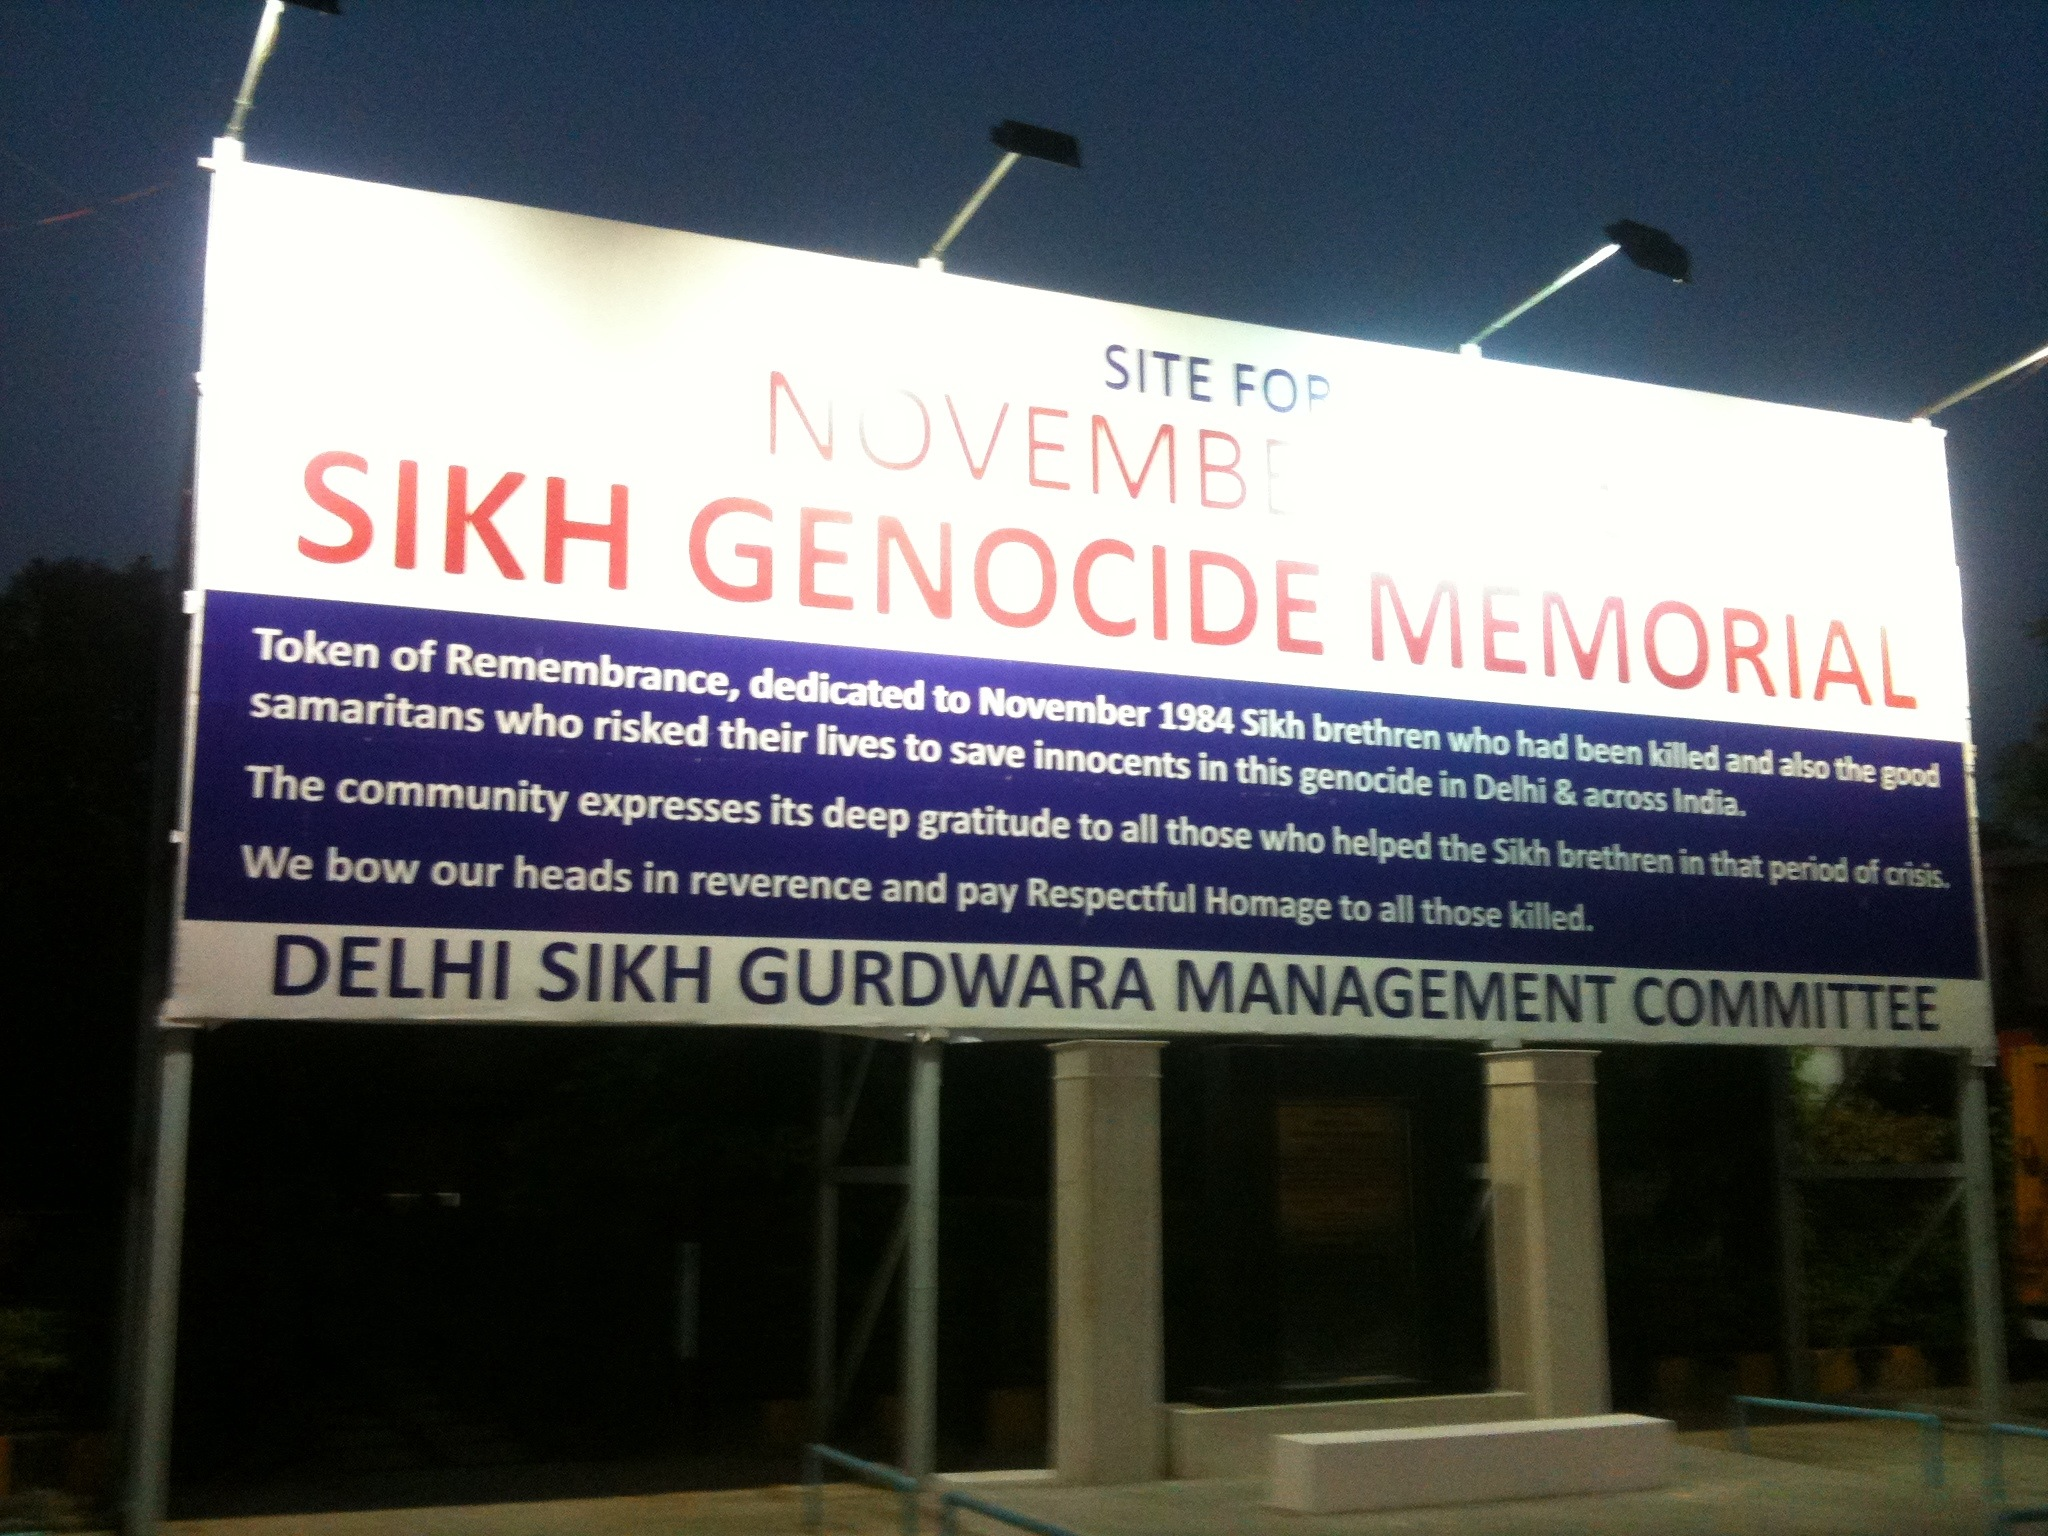 Site for November 1984 Sikh Genocide Memorial